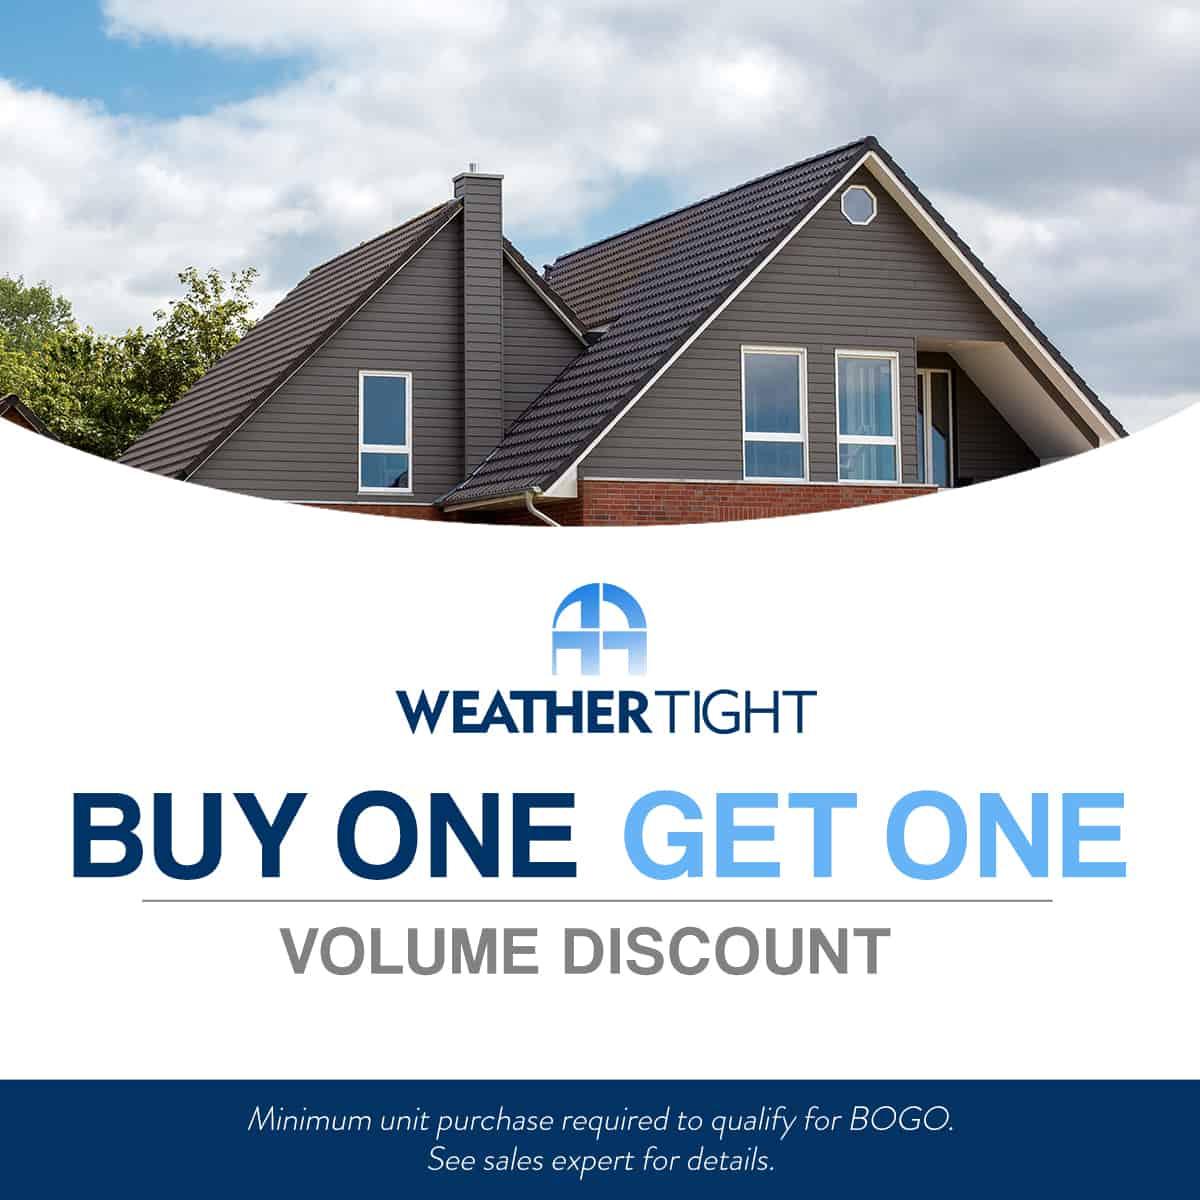 BOGO Volume Discount On Windows, Siding, Roofing, & Doors